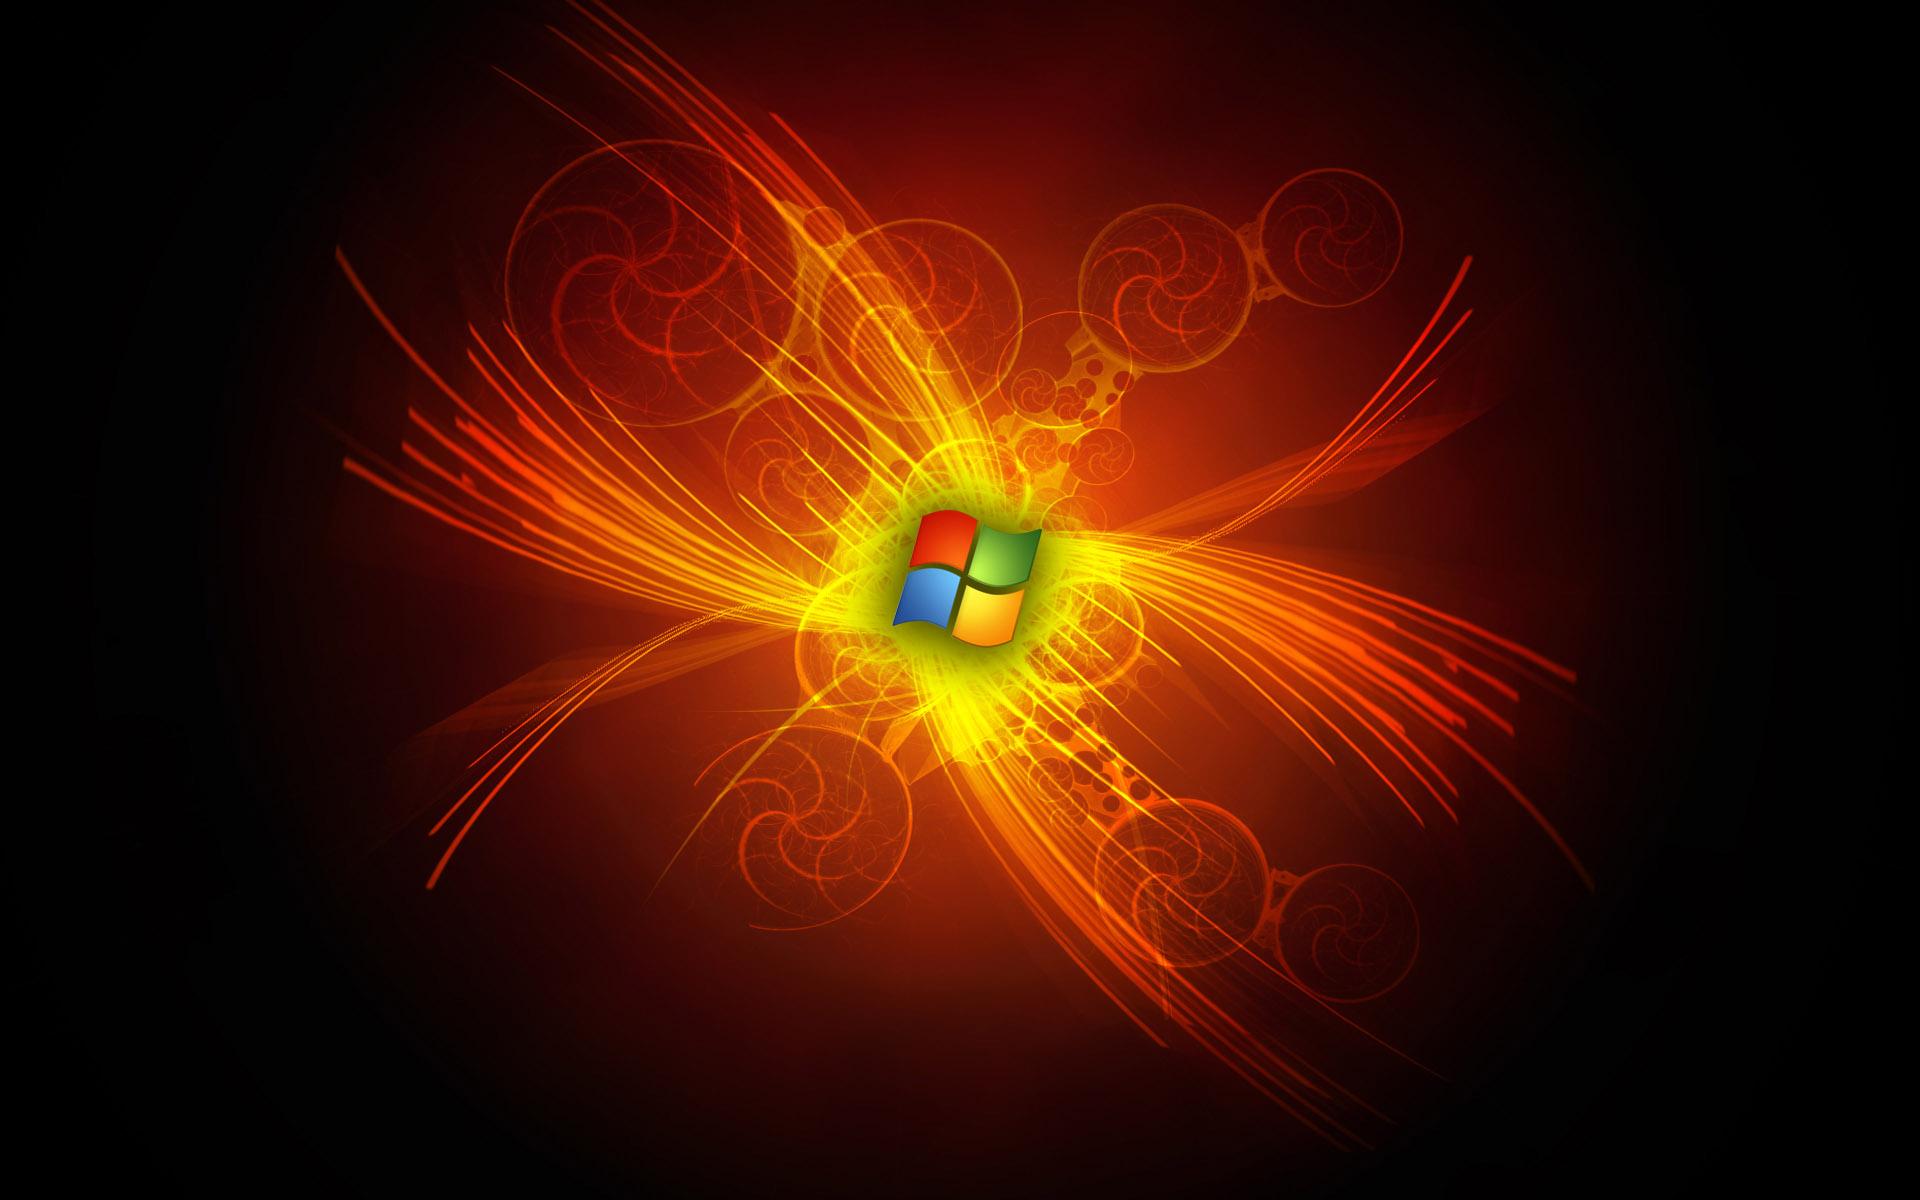 Technology - Windows  Abstrakt Intense Microsoft Logo Seven Se7en Eld Flame Cool Windows Home Server 2100 Bakgrund